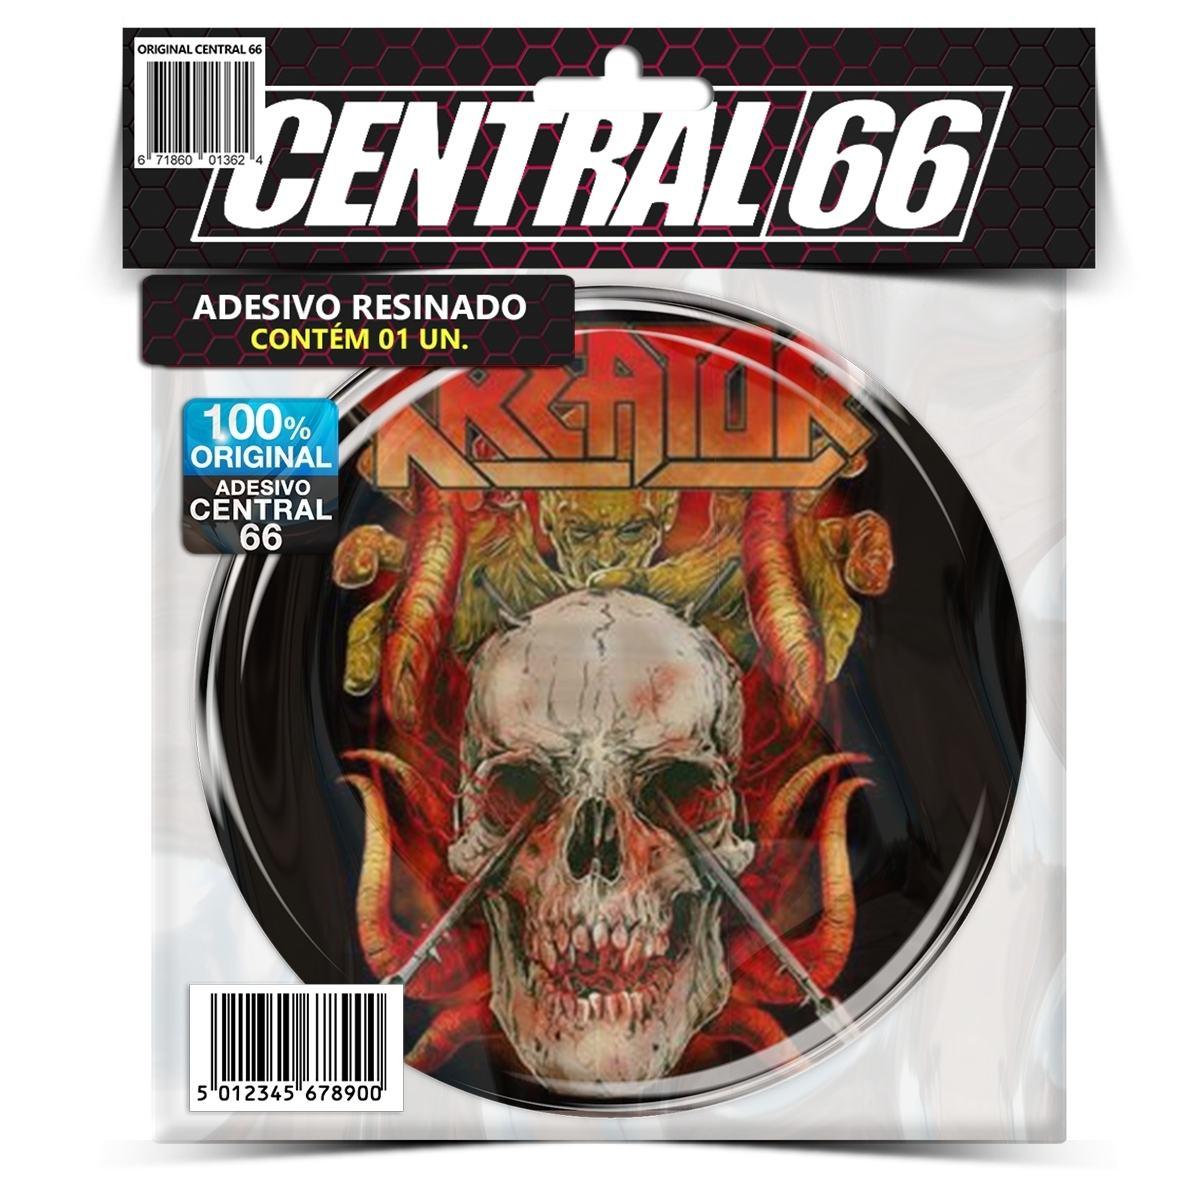 Adesivo Redondo Rammstein Psicodelic  – Central 66